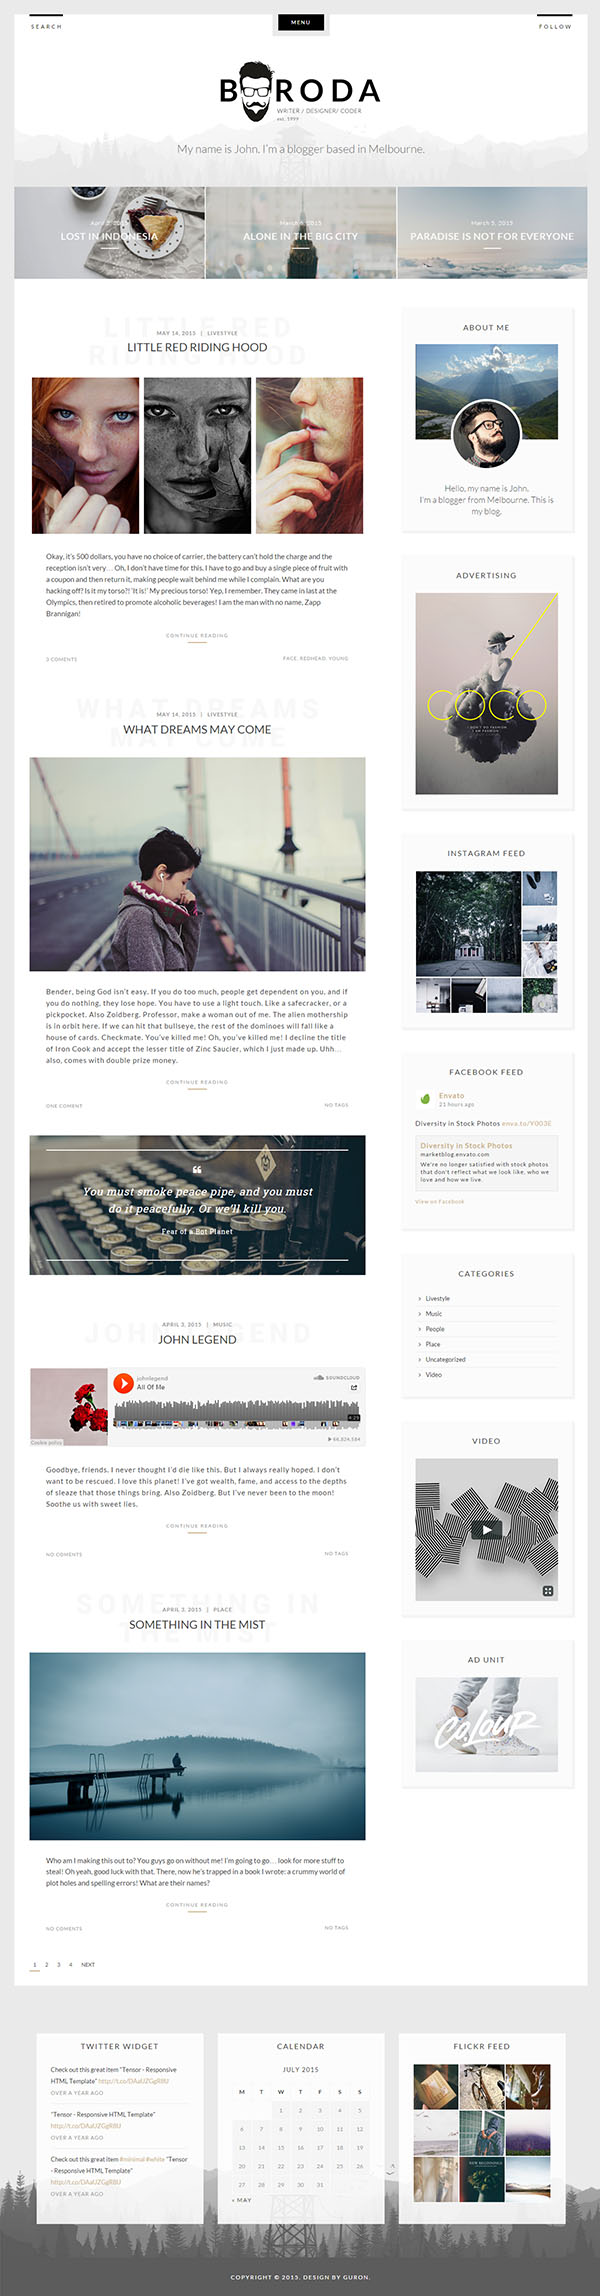 Boroda Personal Blog WordPress Theme